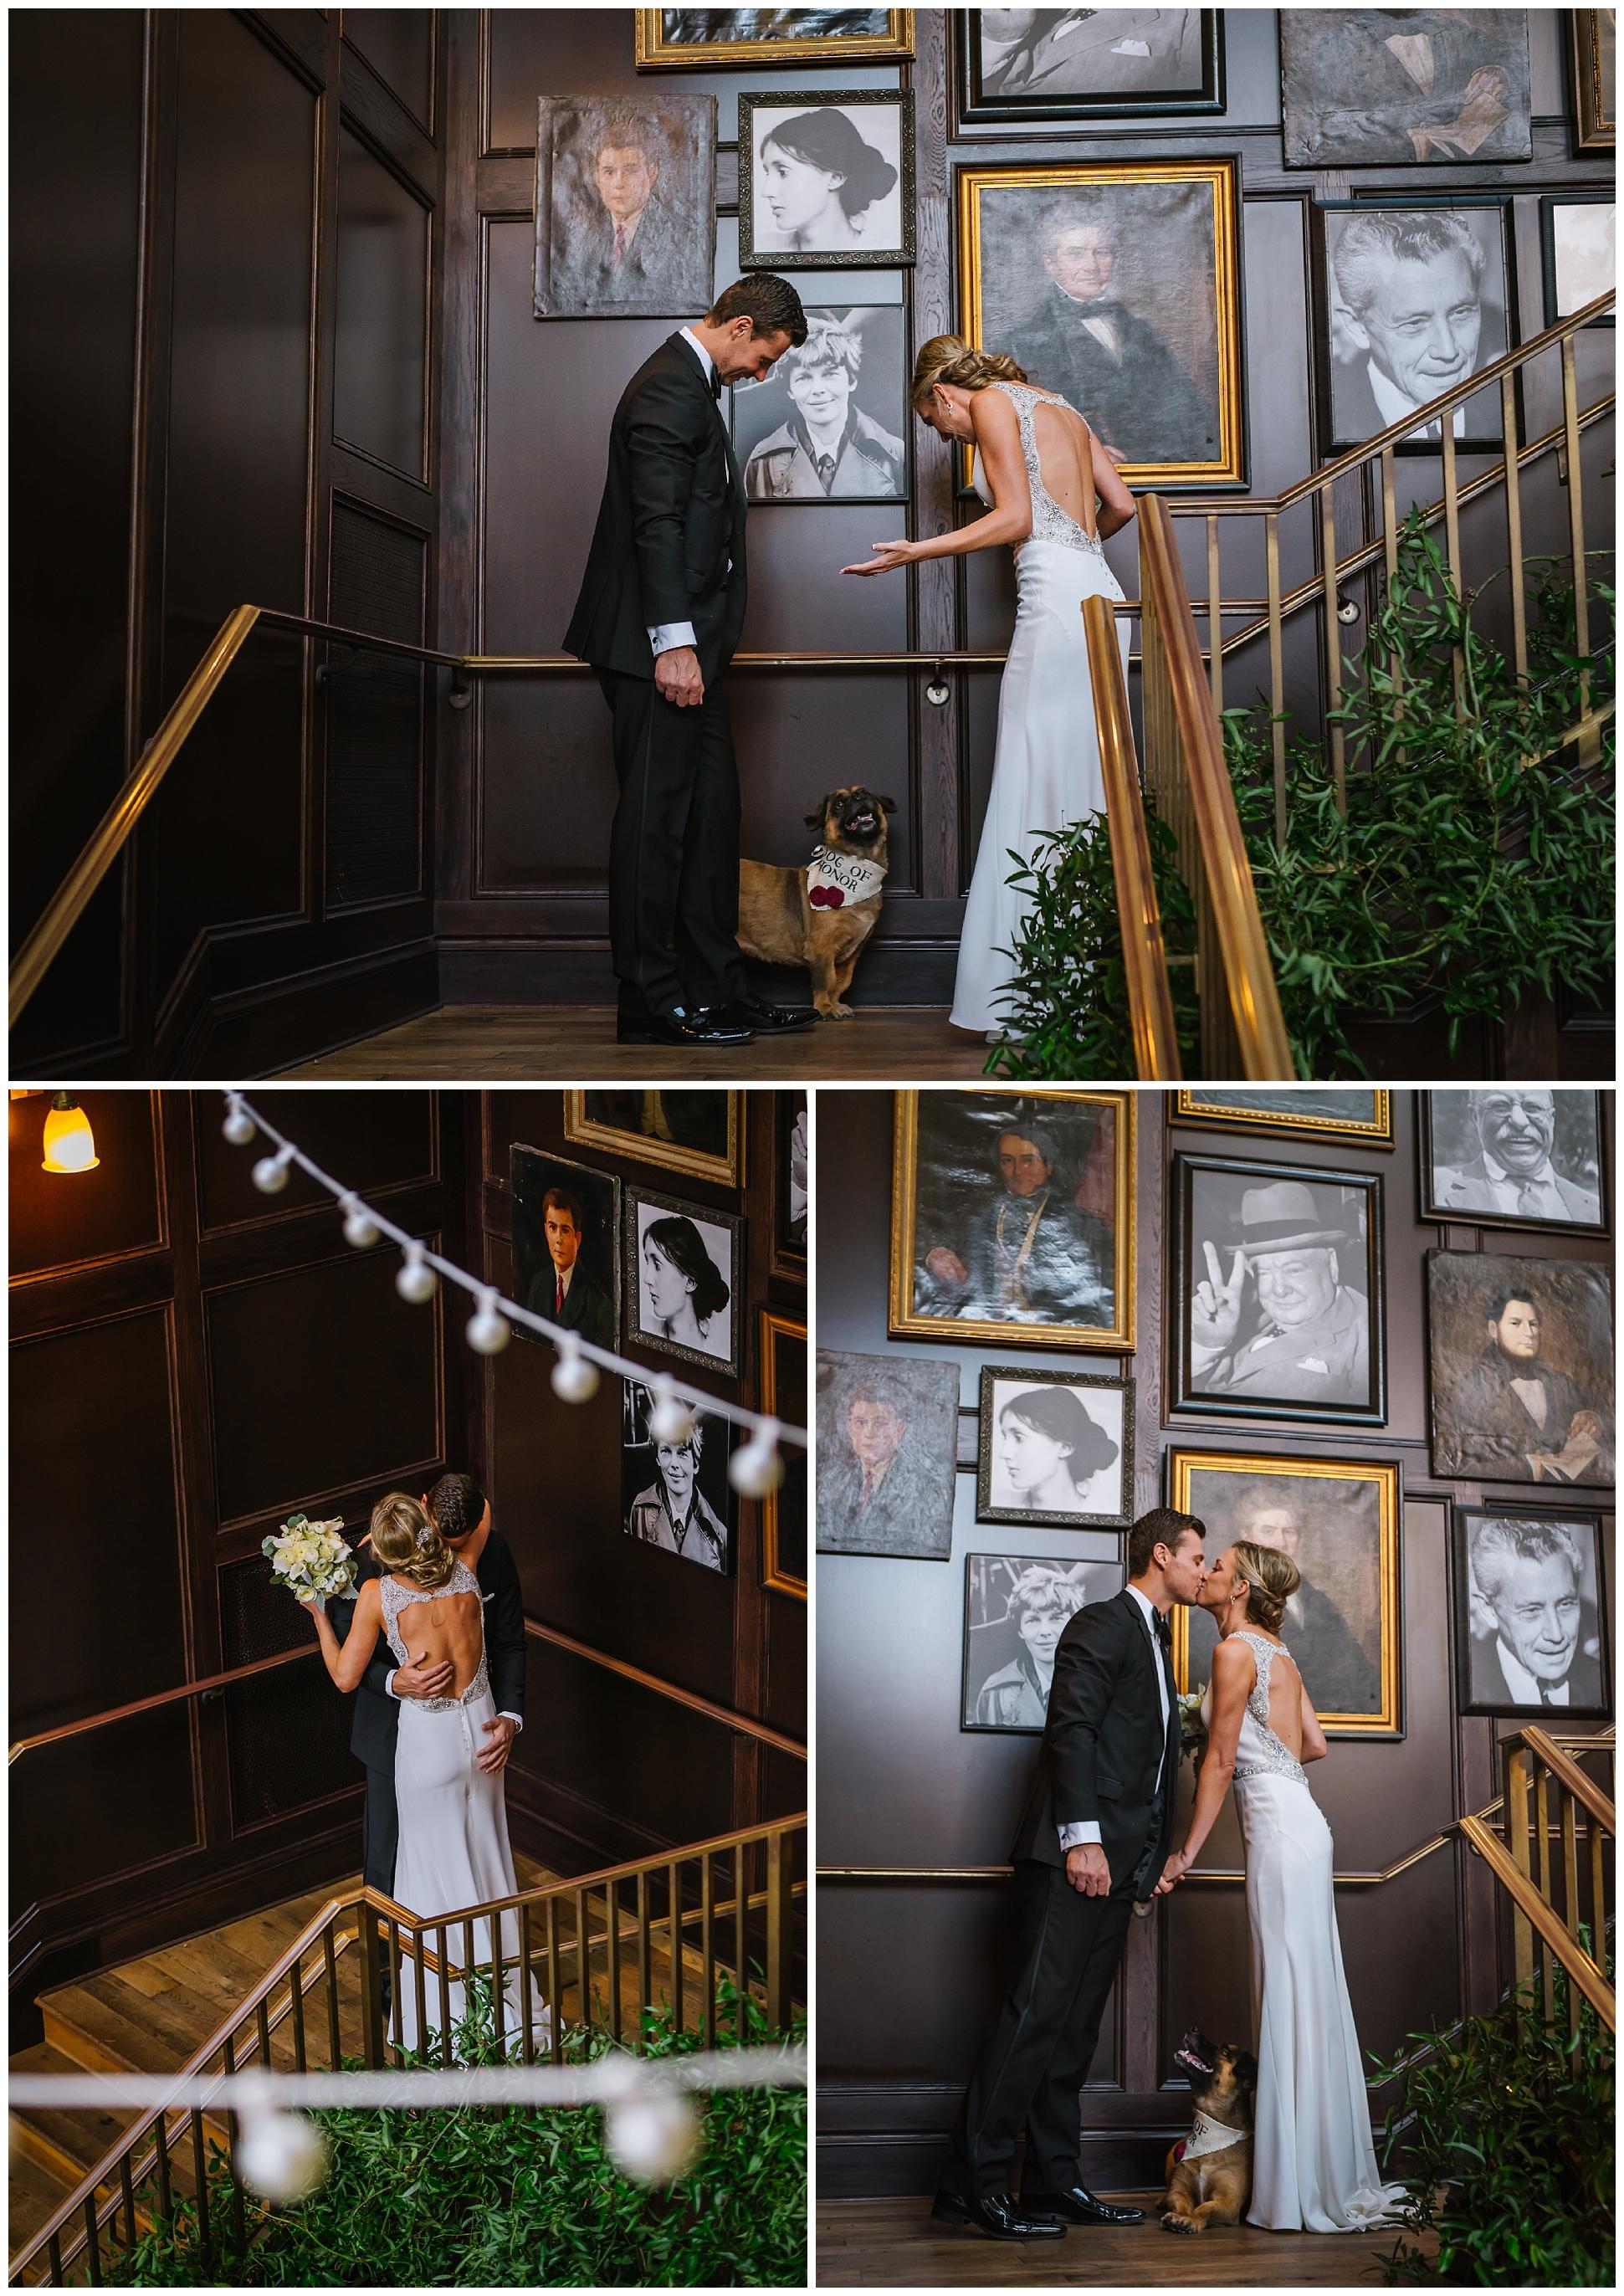 Oxford-exchange-wedding-photogapher-garland-candels-bookstore-burgandy-botanica_0029.jpg